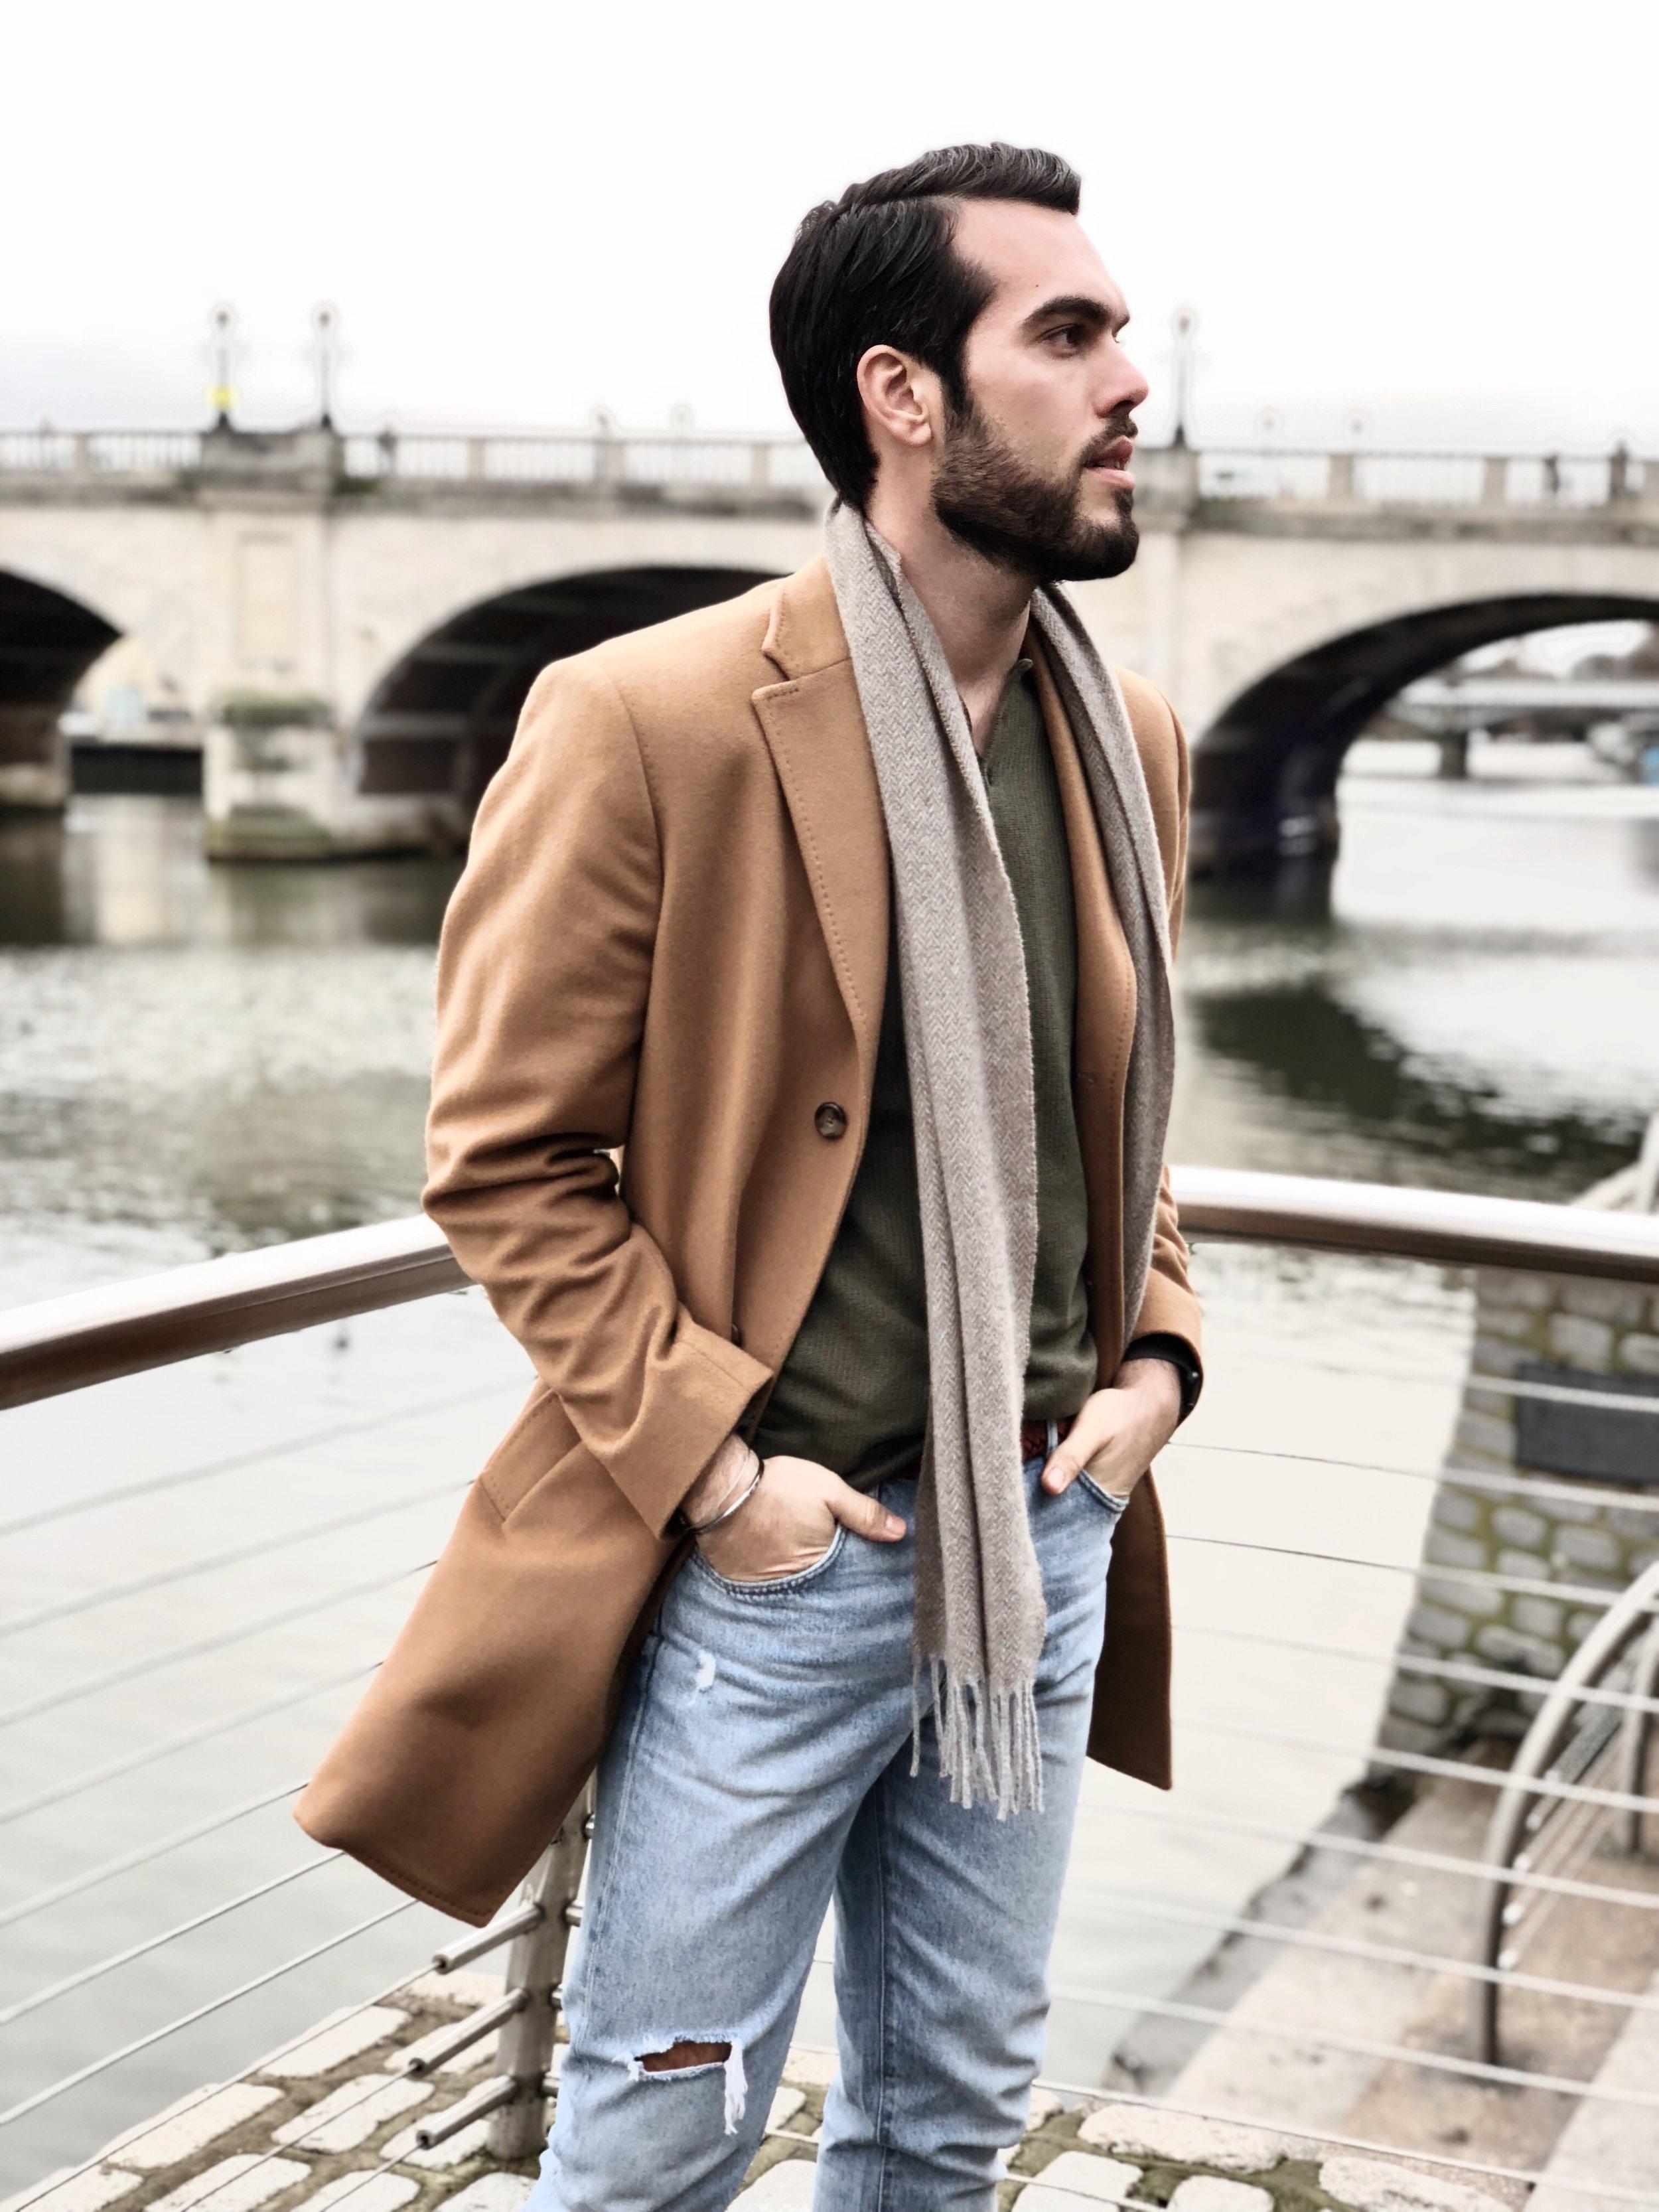 Coat: Massimo Dutti / Jeans: Zara / Cashmere scarf: Hackett Lodnon